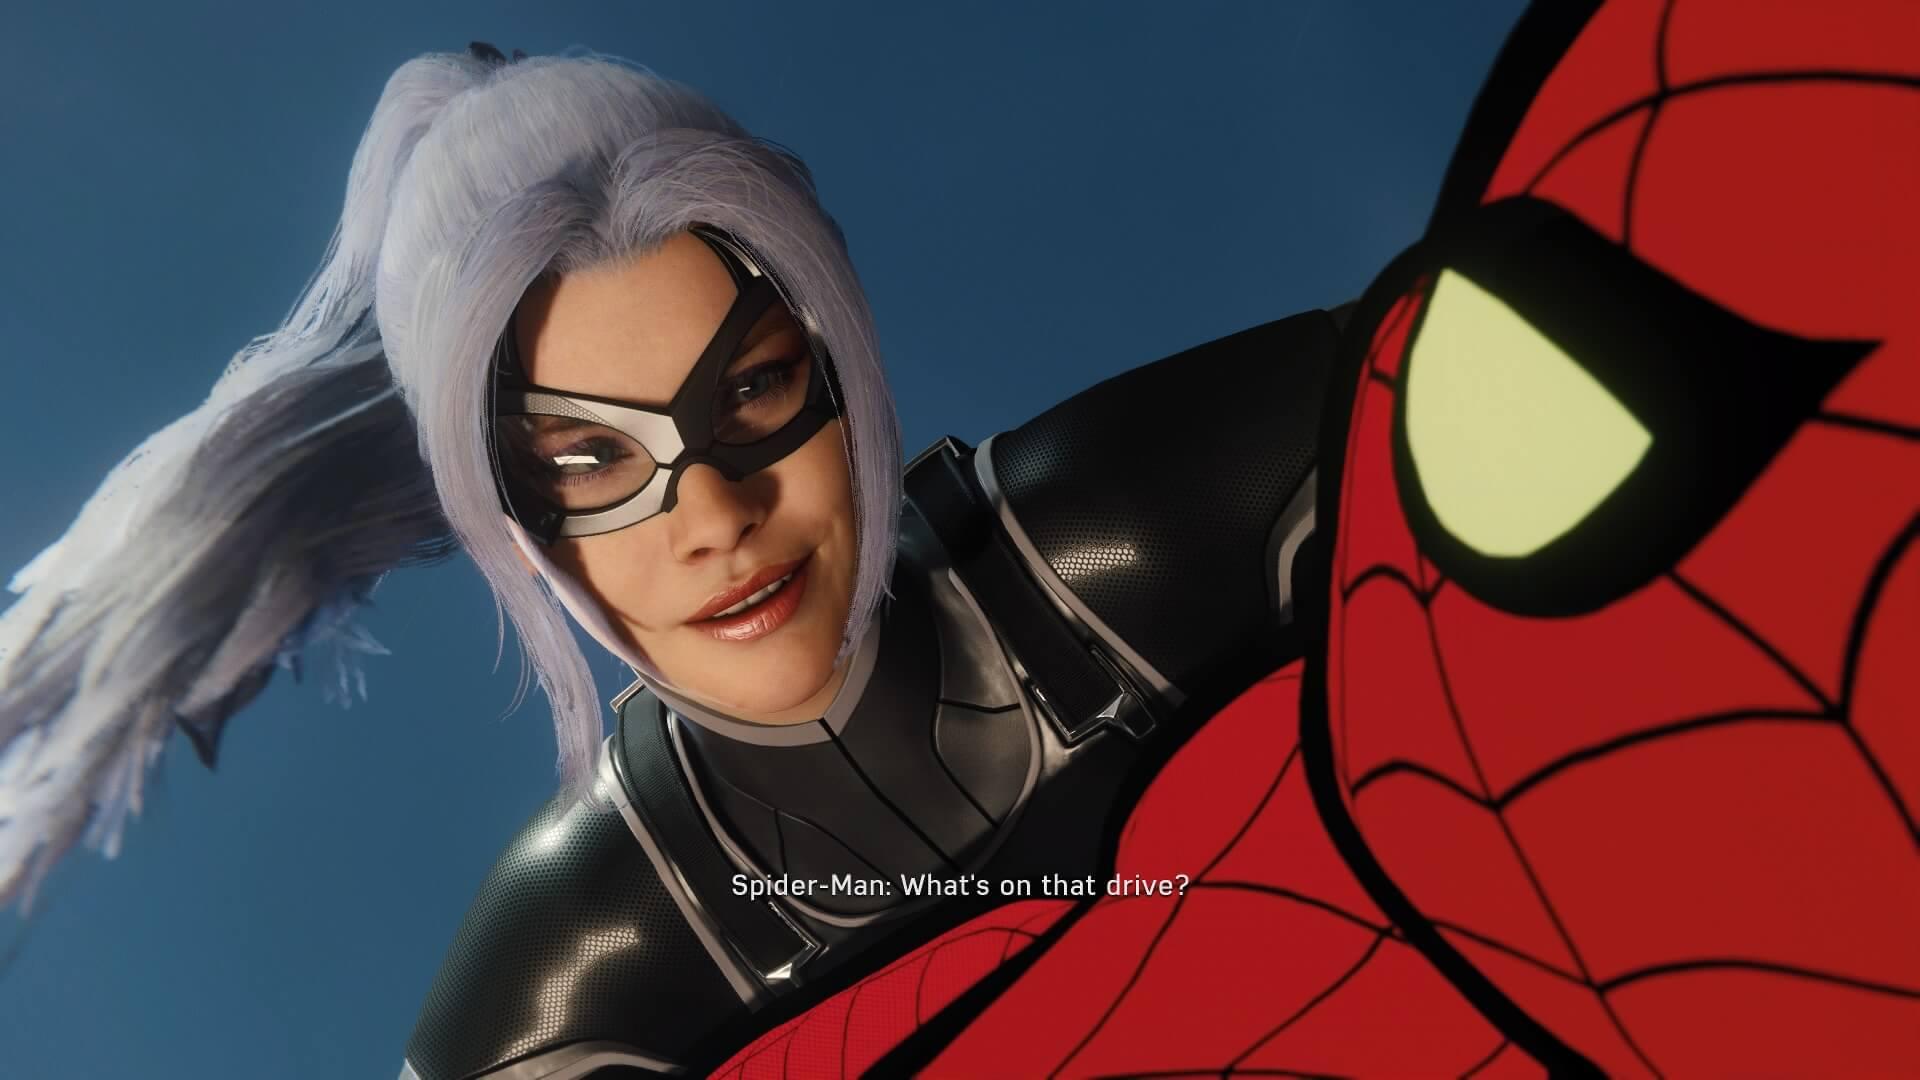 Spider-Man O Assalto, Spider-Man de PS4, Spider-Man PS4, Insomniac, Delfos